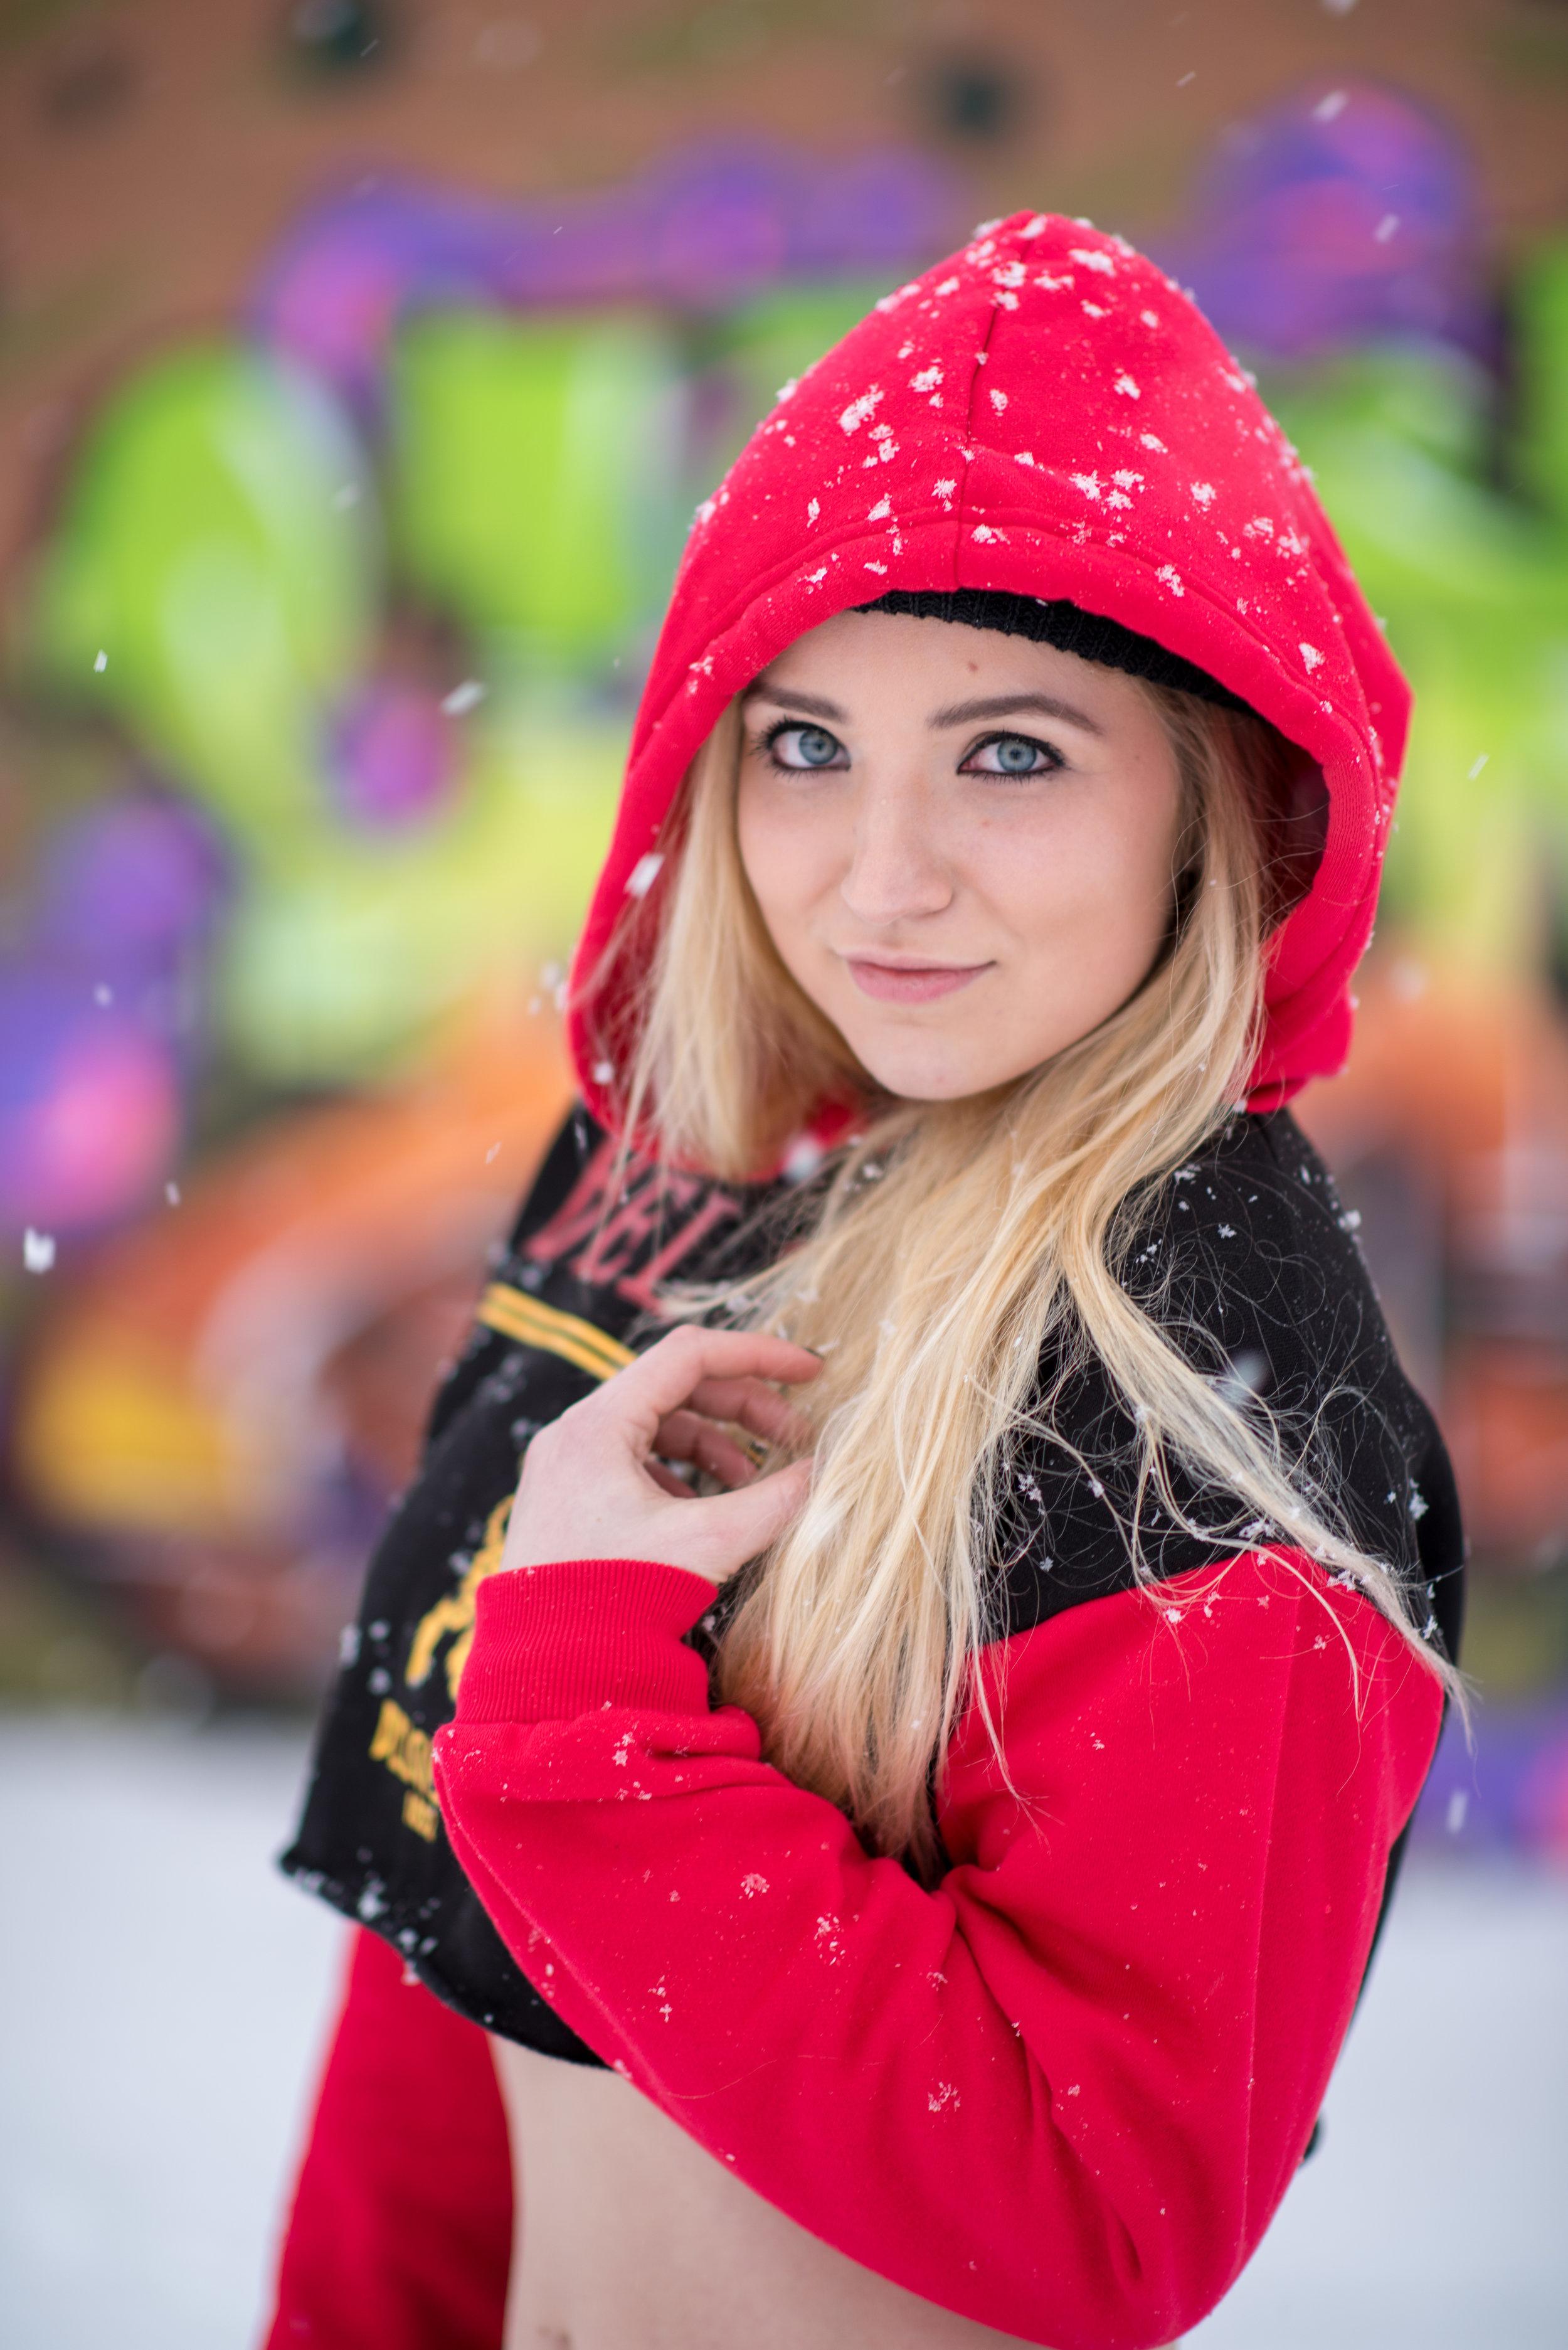 Tyler Harney Photography-Kaereilly Snow Shoot_ (13).jpg